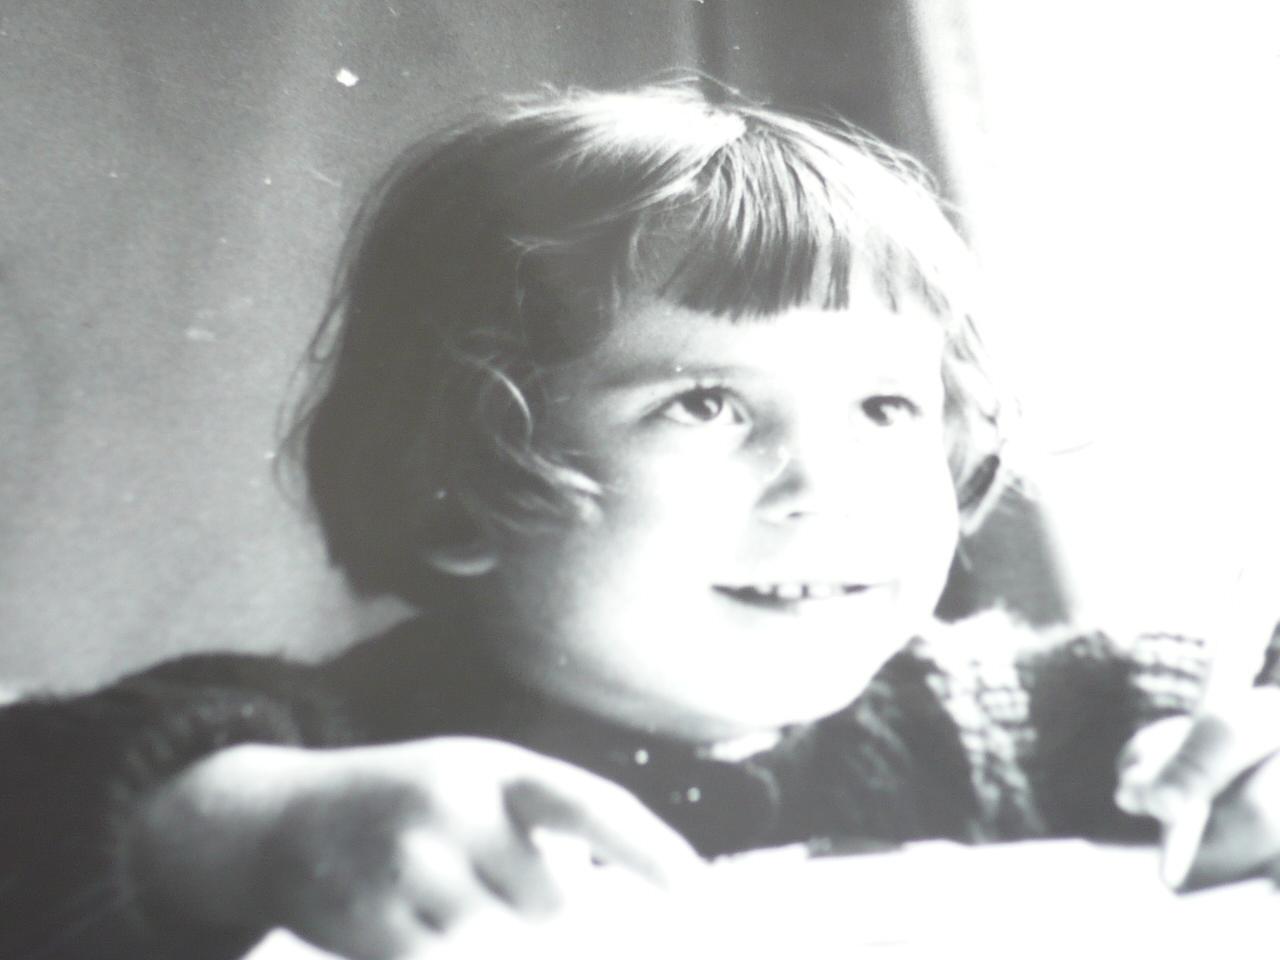 Fabiero, Susann Spt. 1967